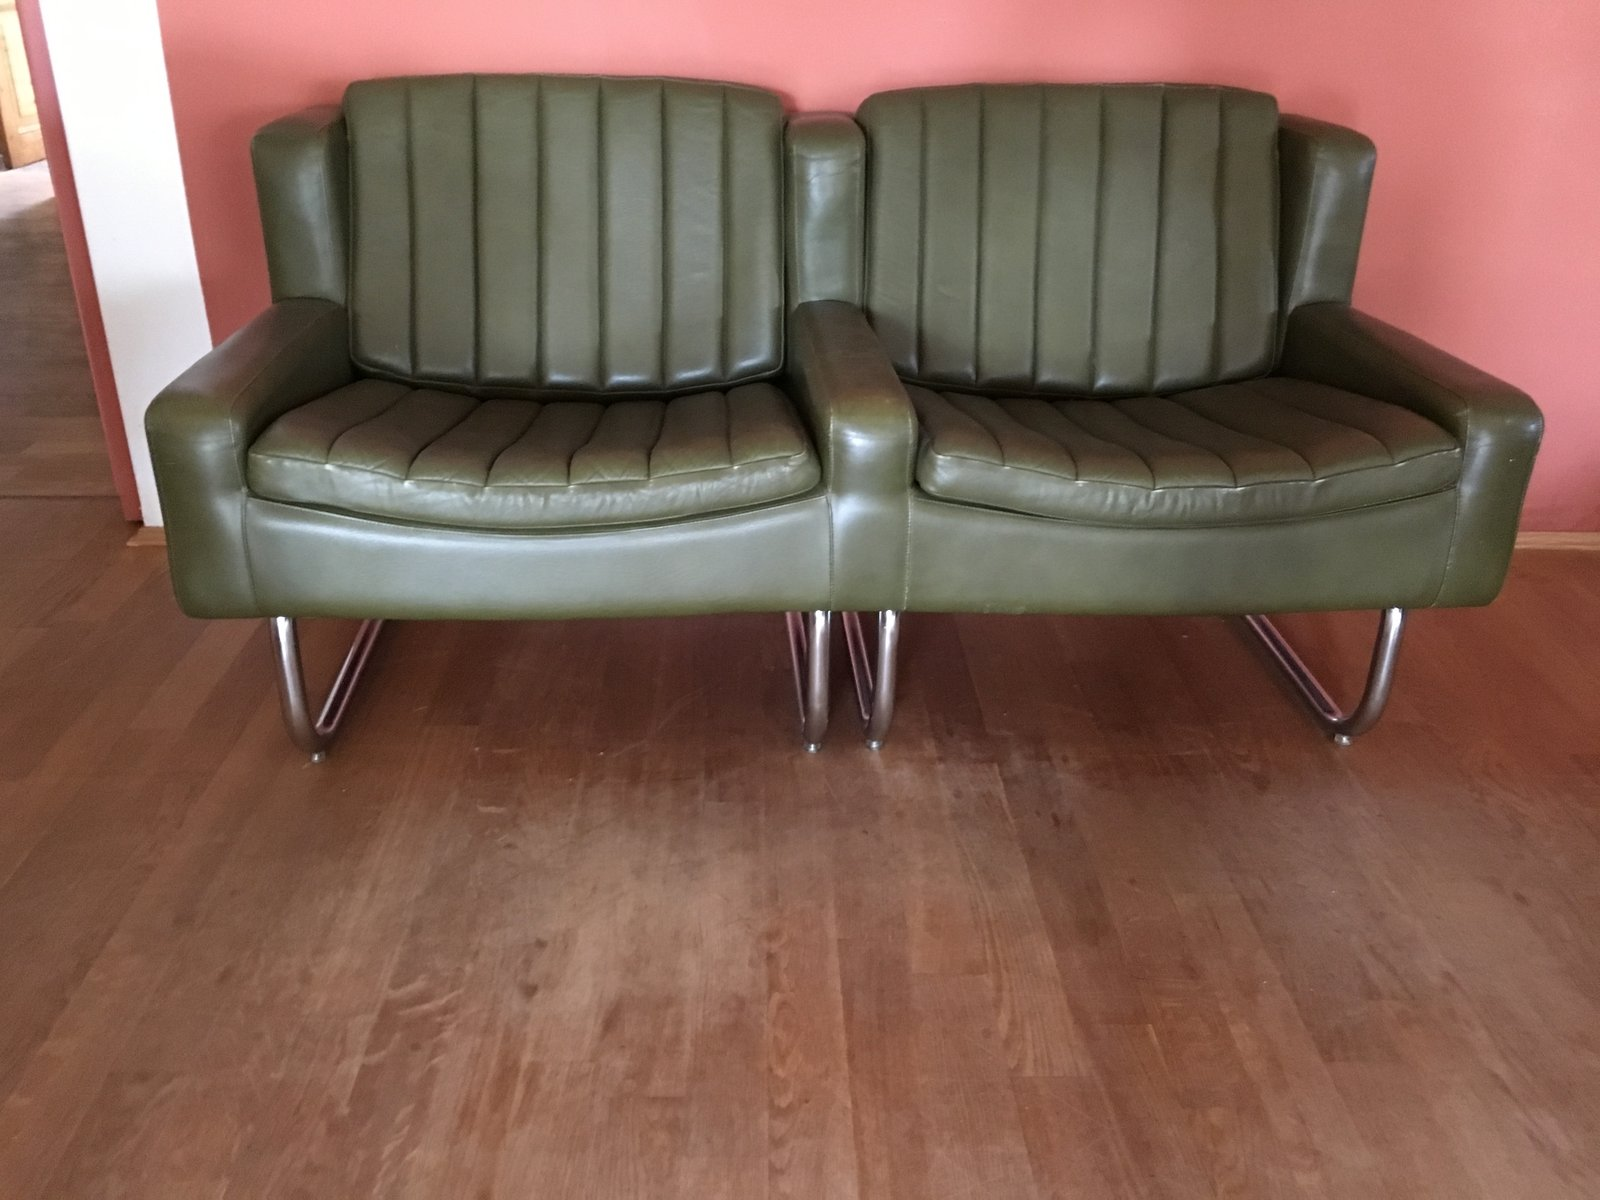 vintage freischwinger sessel sofa set von asko bei. Black Bedroom Furniture Sets. Home Design Ideas